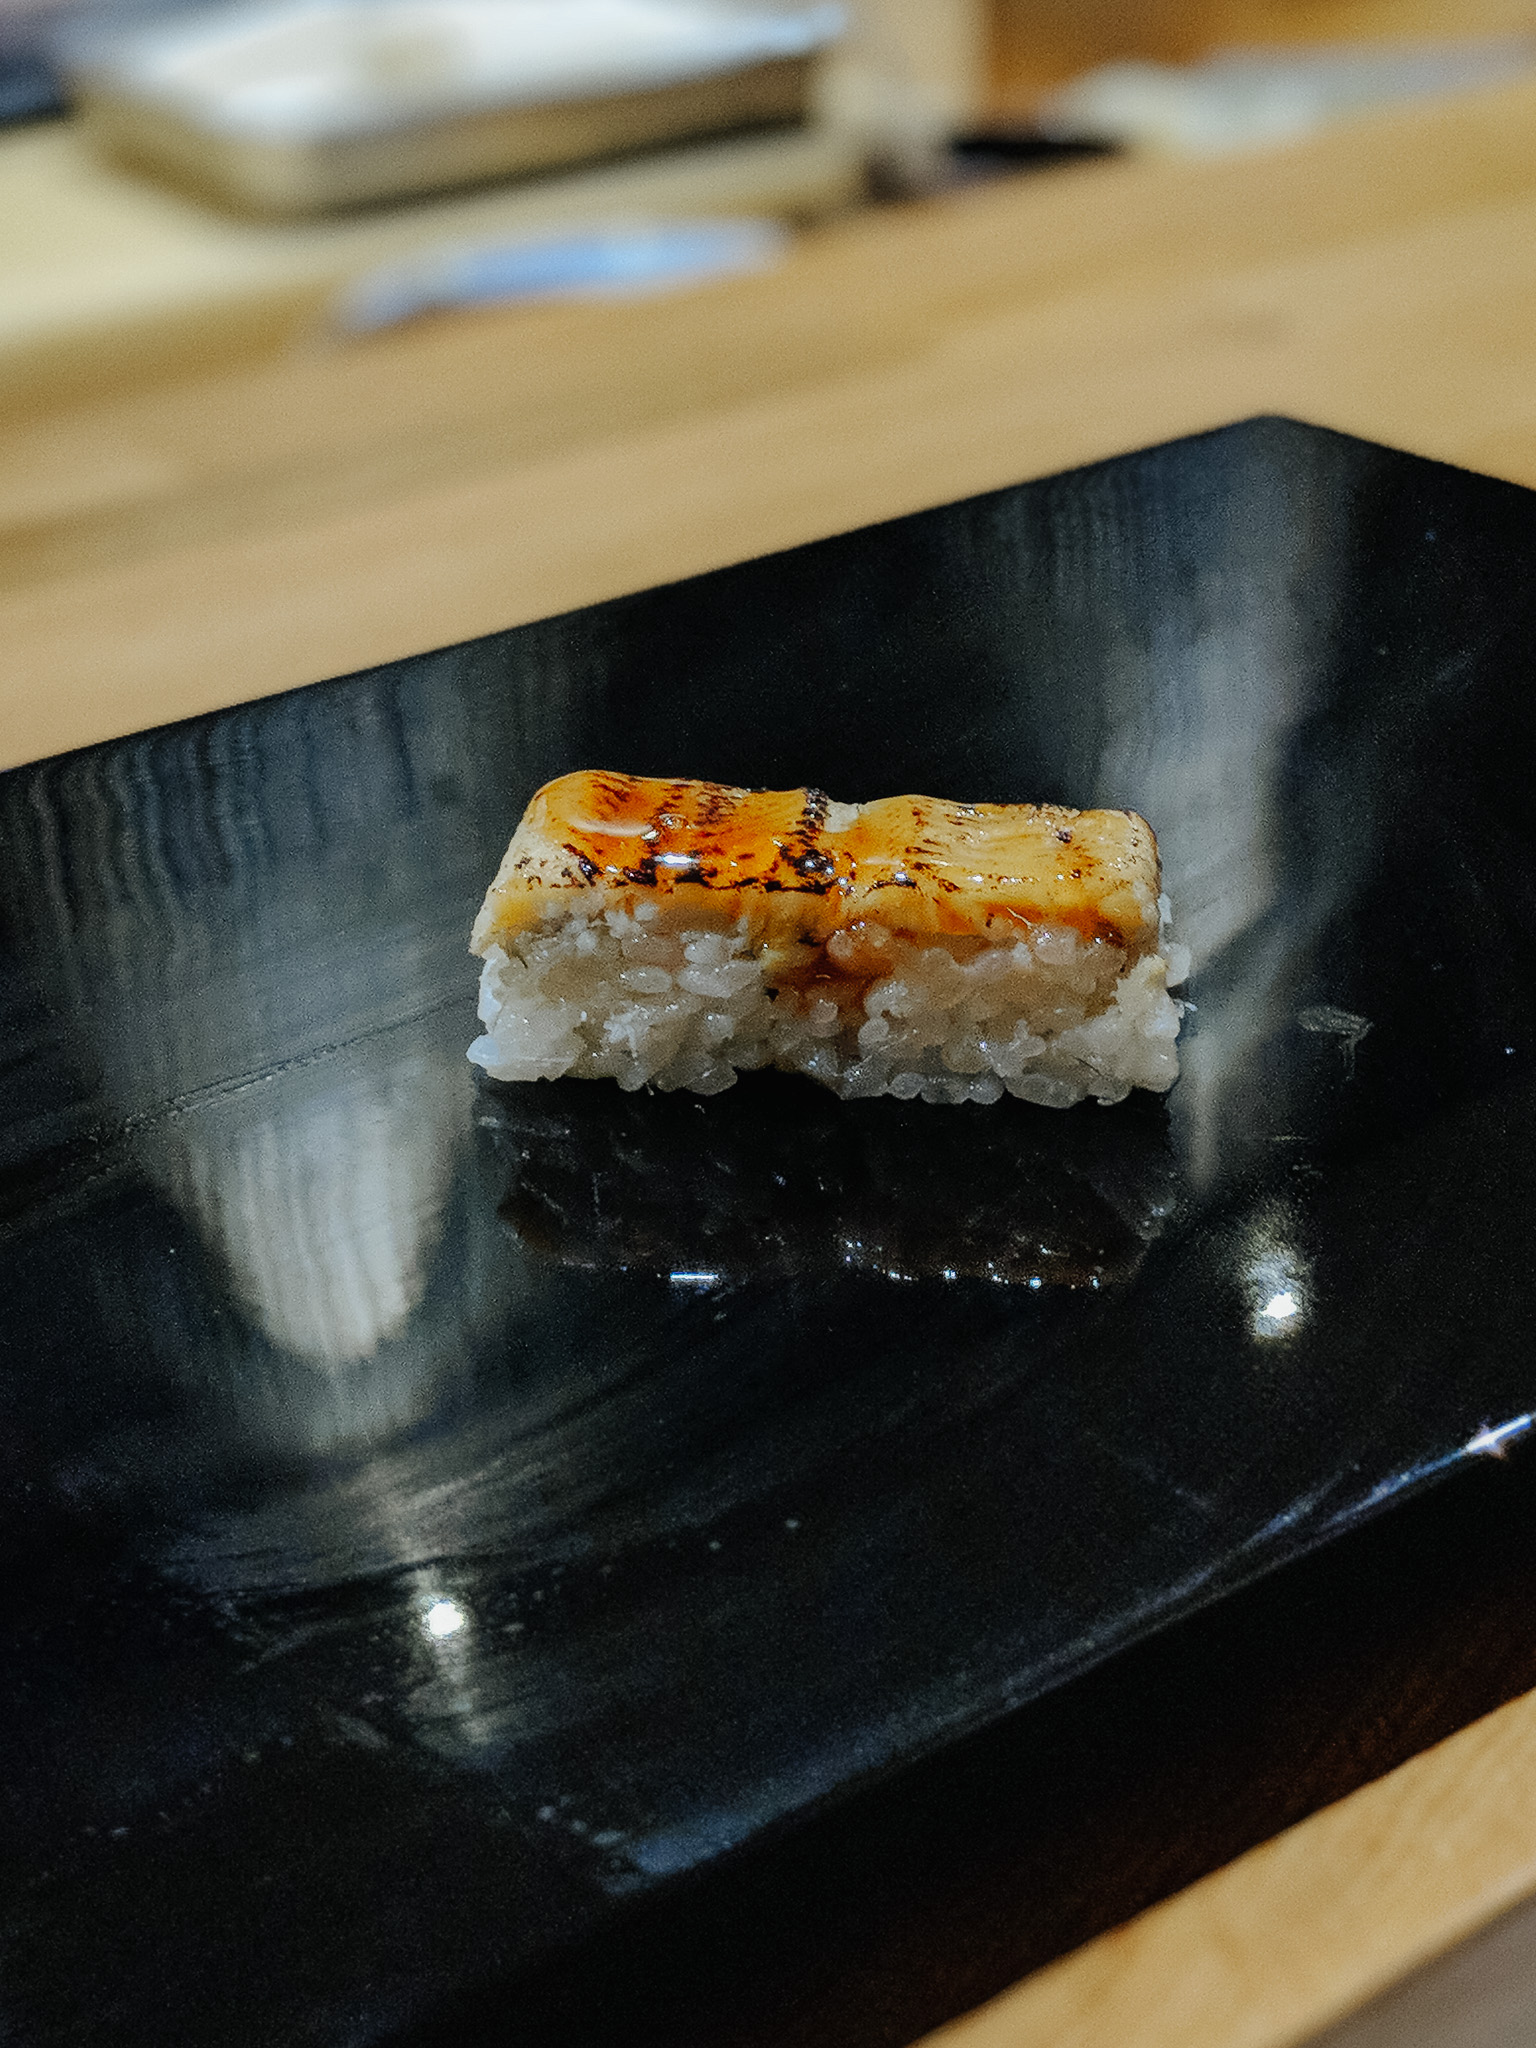 minamishima-melbourne-food-photographer-014.JPG